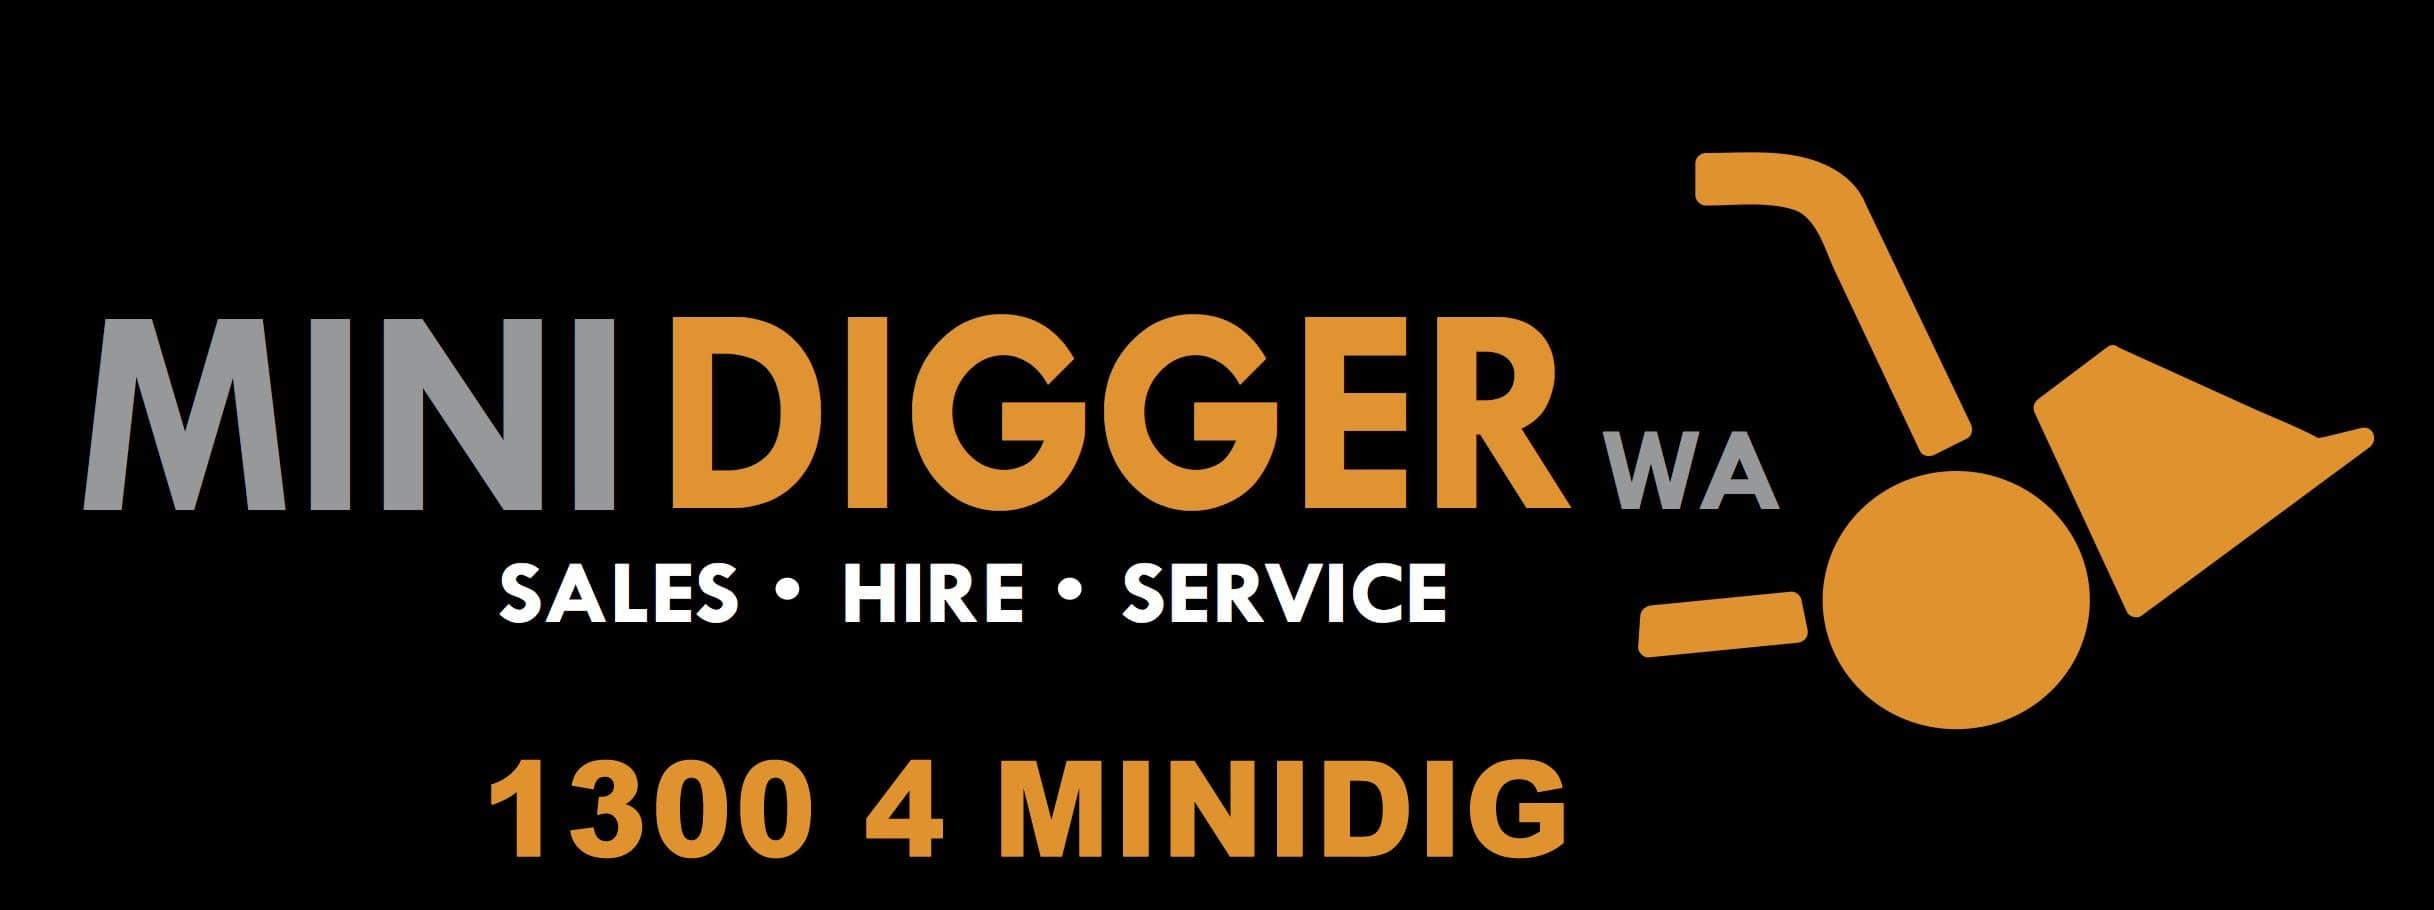 Mini Digger WA (@minidiggerwa) Cover Image